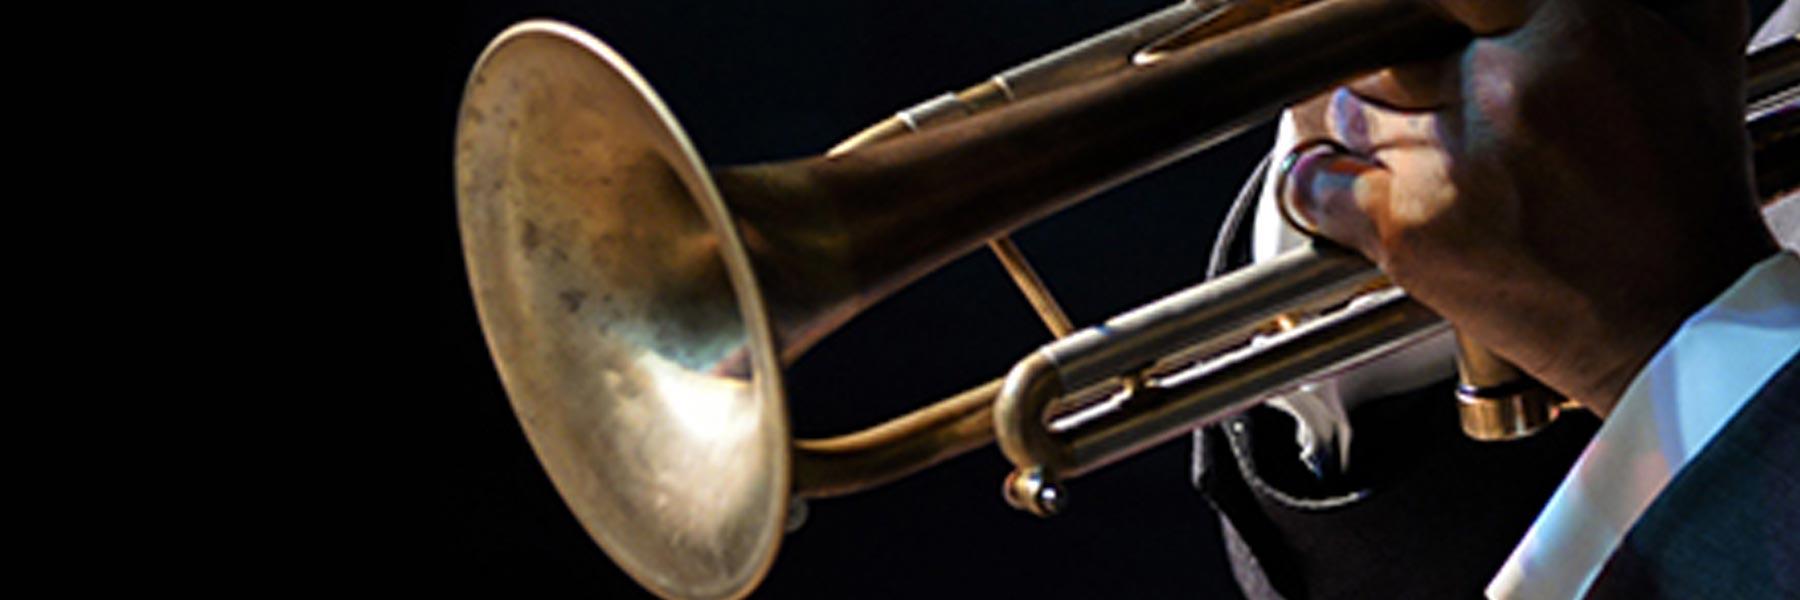 Learn music note read